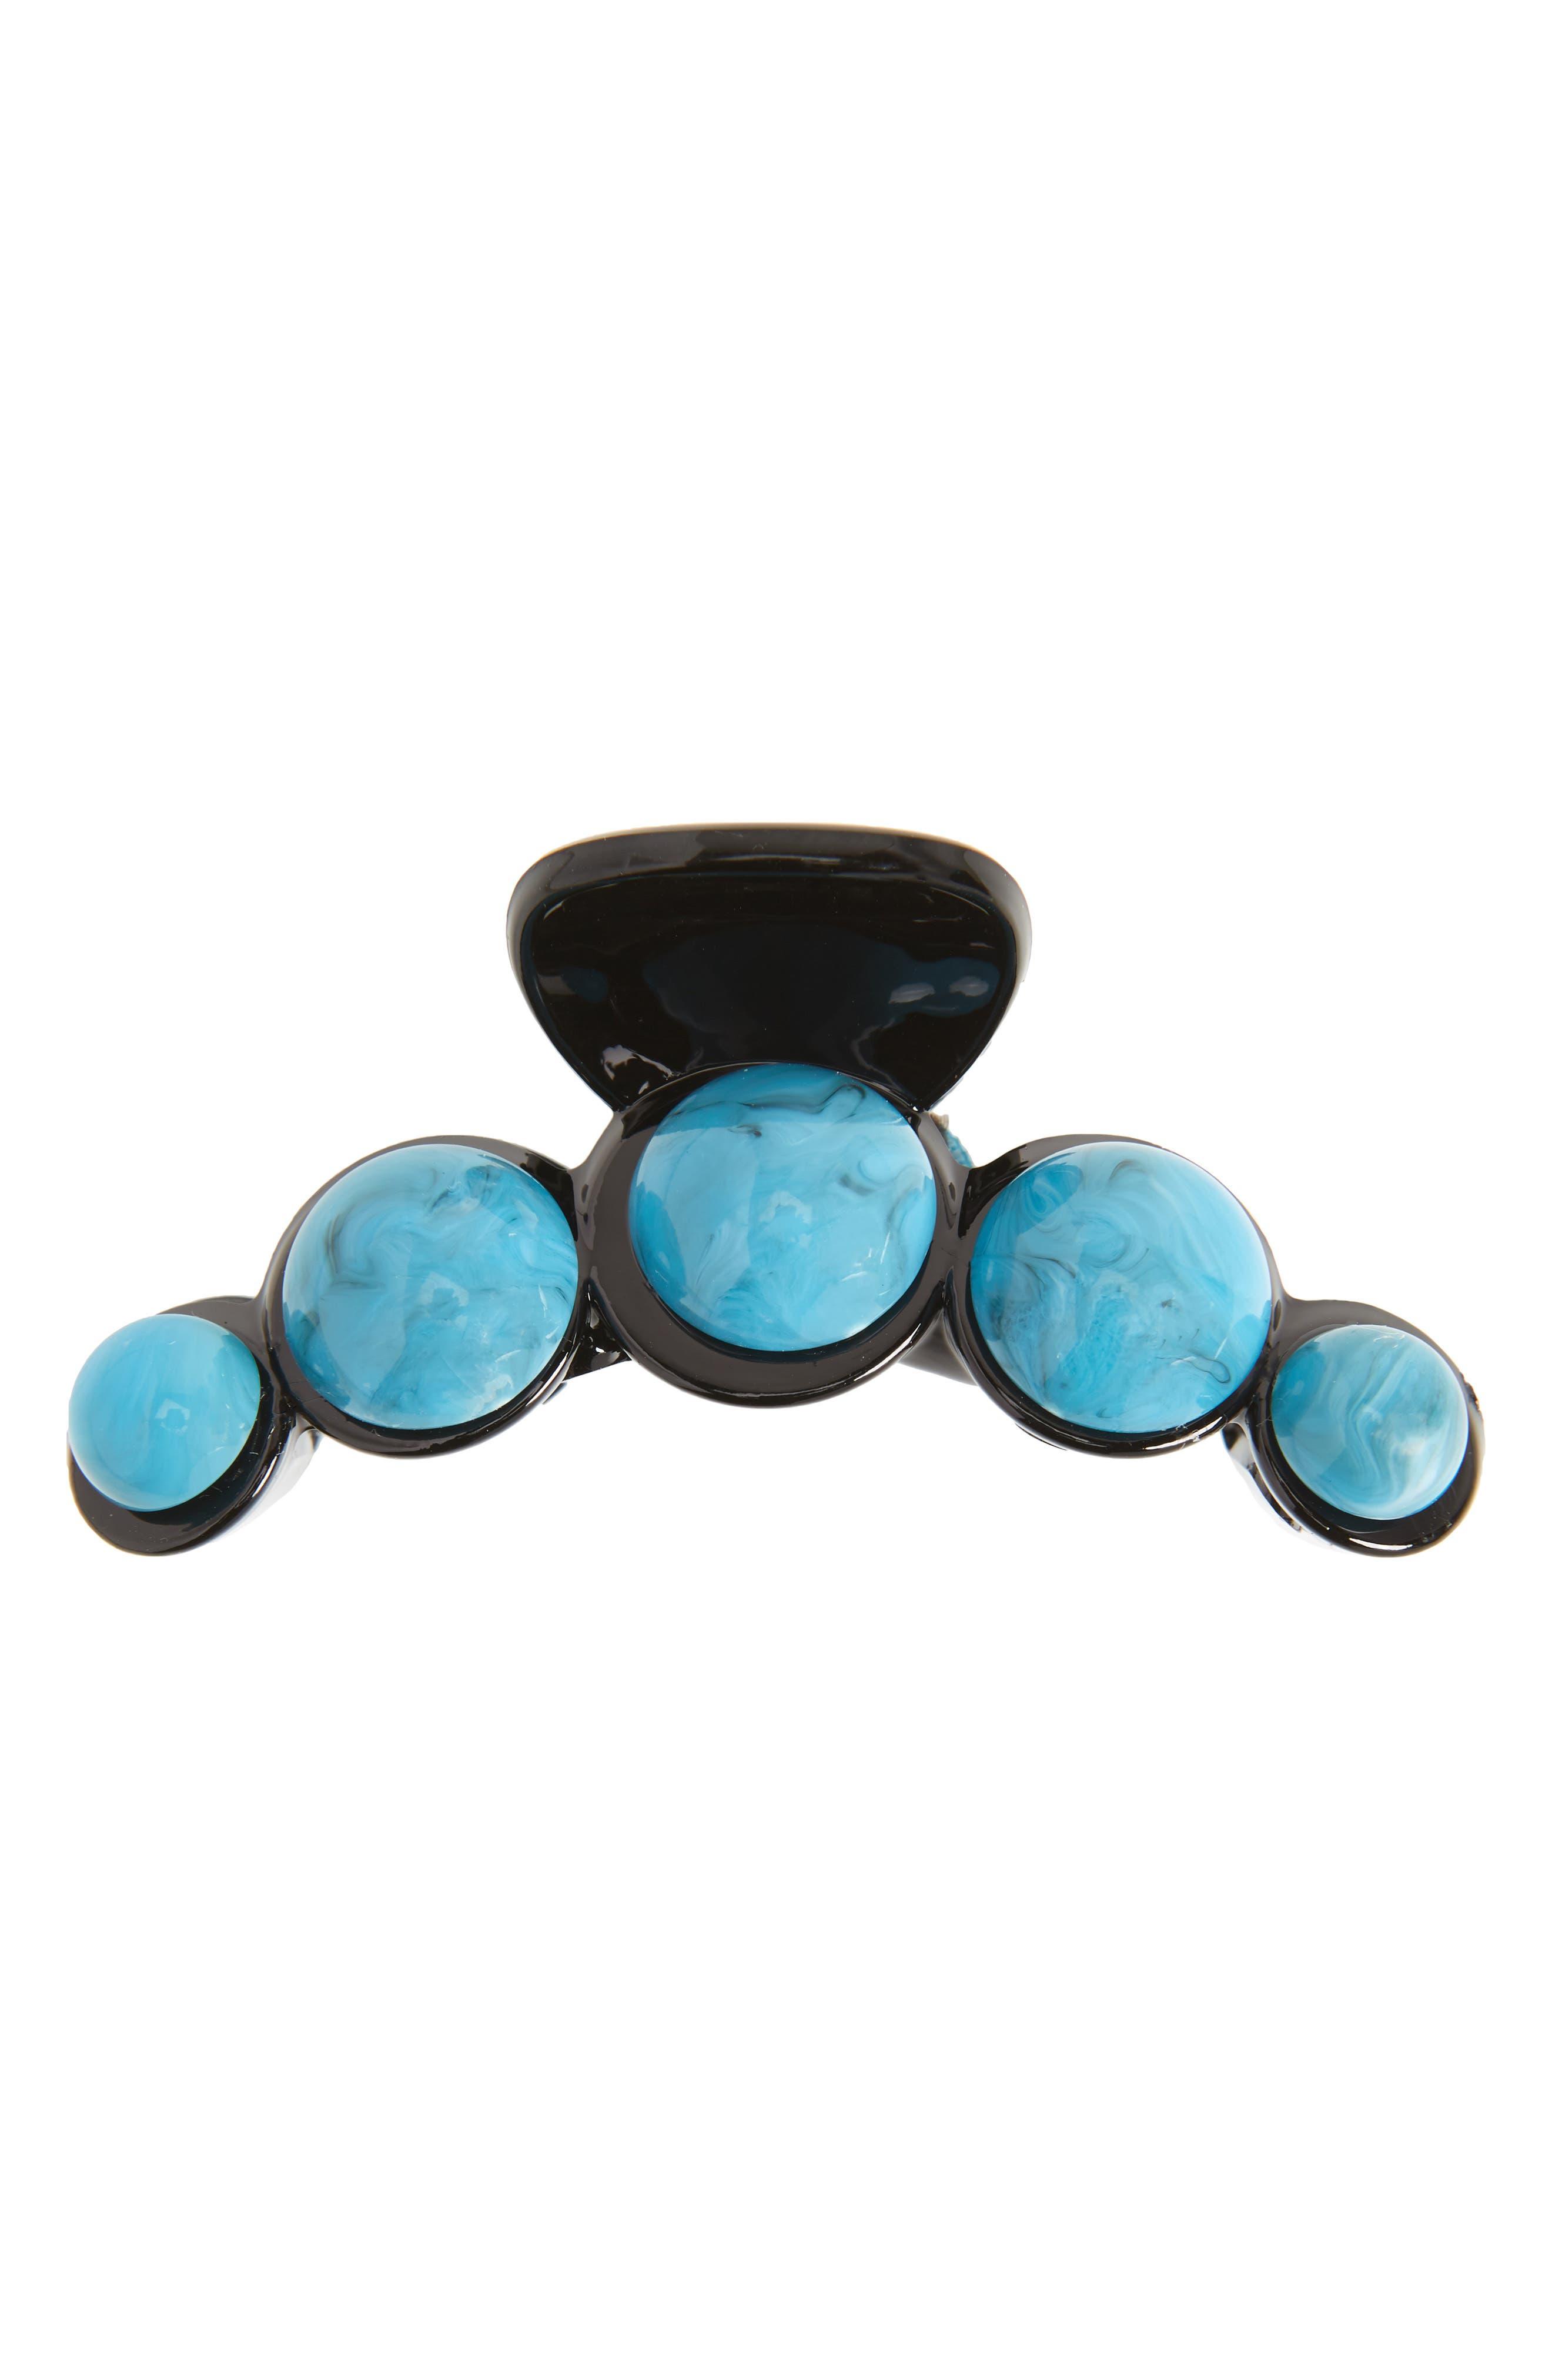 Crystal Jaw Clip,                             Main thumbnail 1, color,                             Black/ Blue